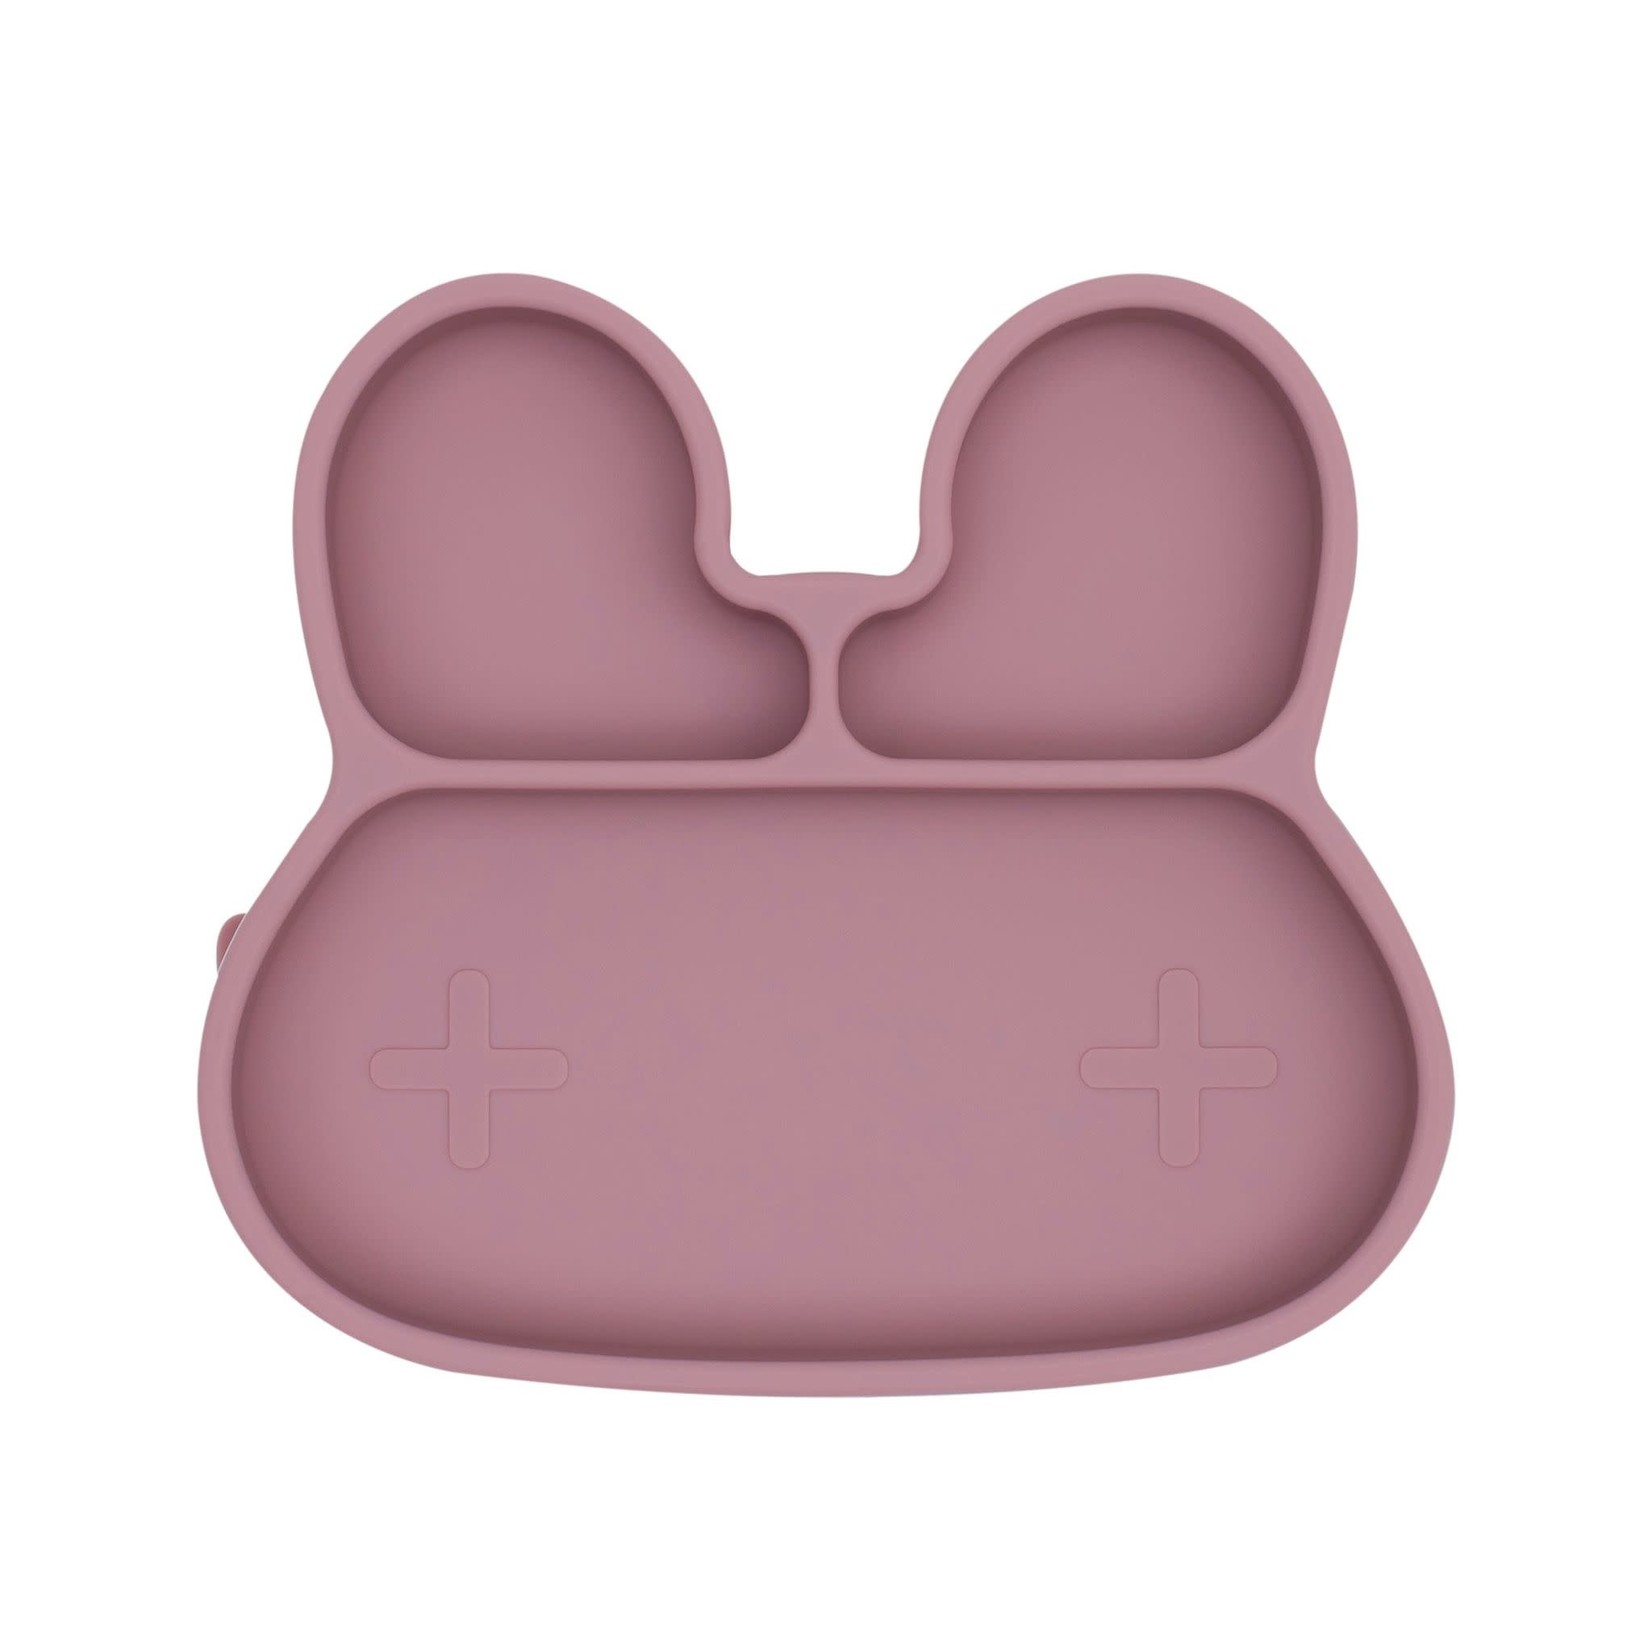 We Might Be Tiny Bunny Sticky Plate (Dusty Rose)